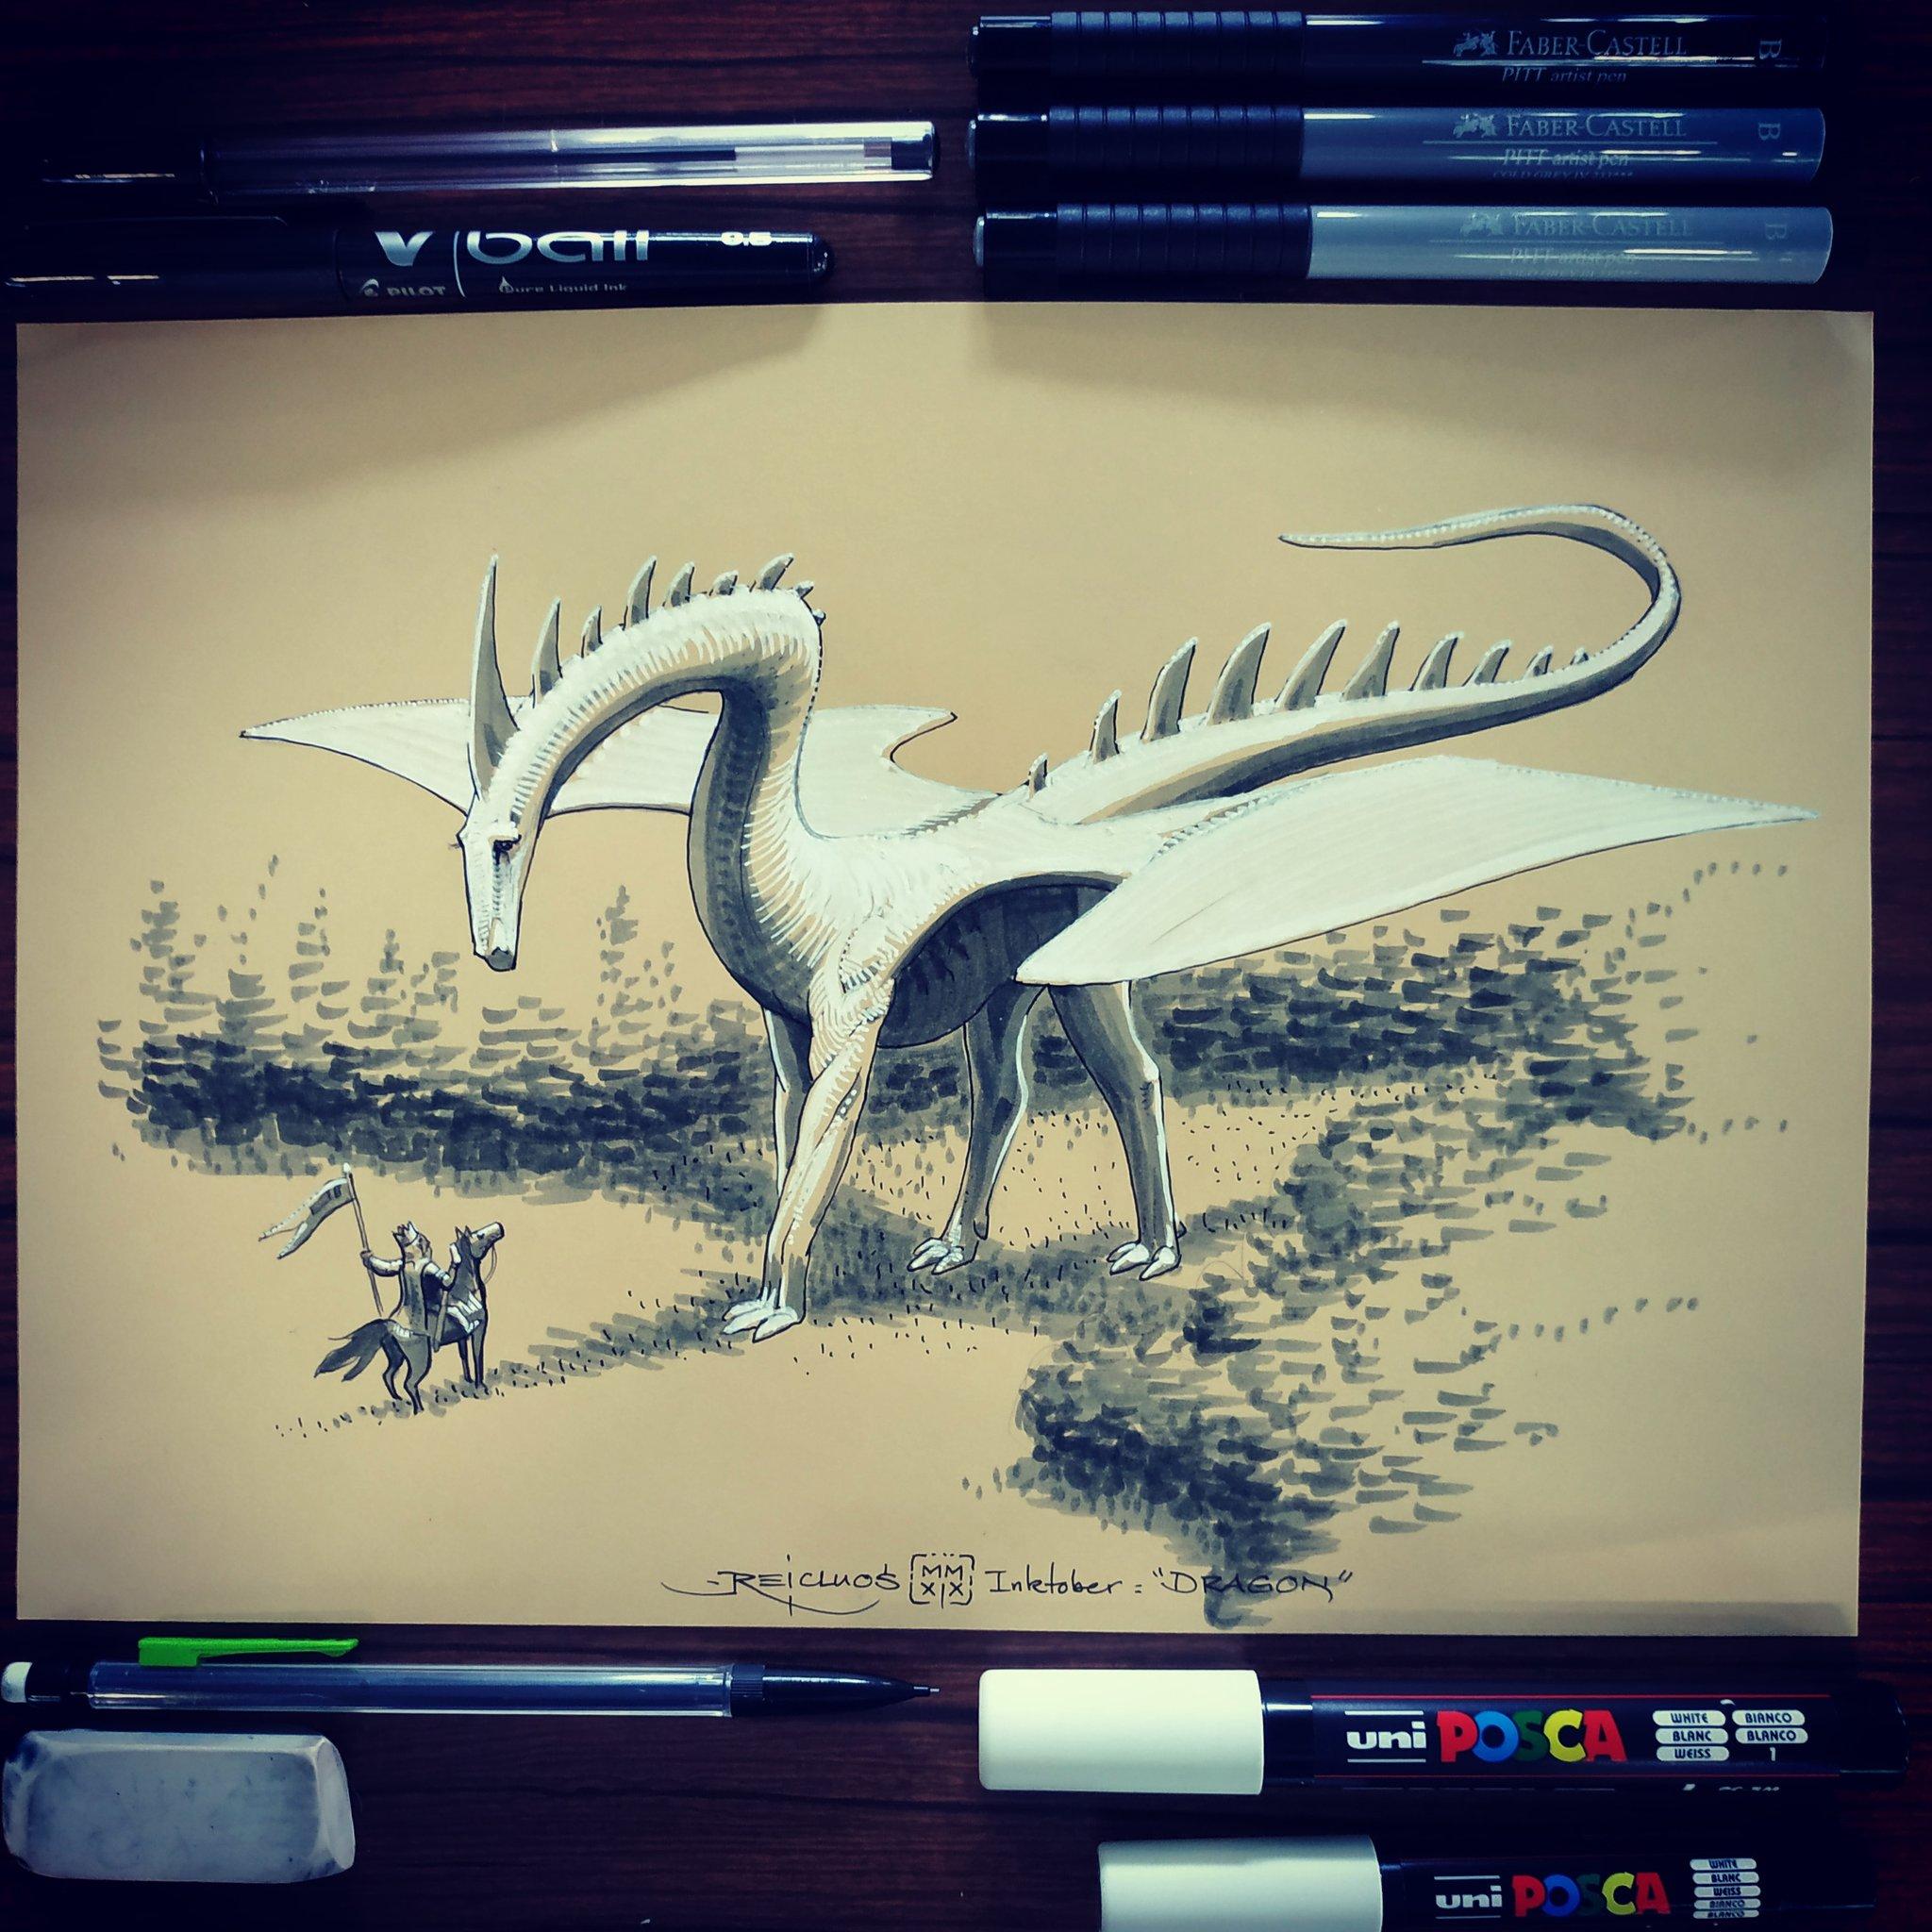 Dragon (Inktober jour 12) – Reicluos